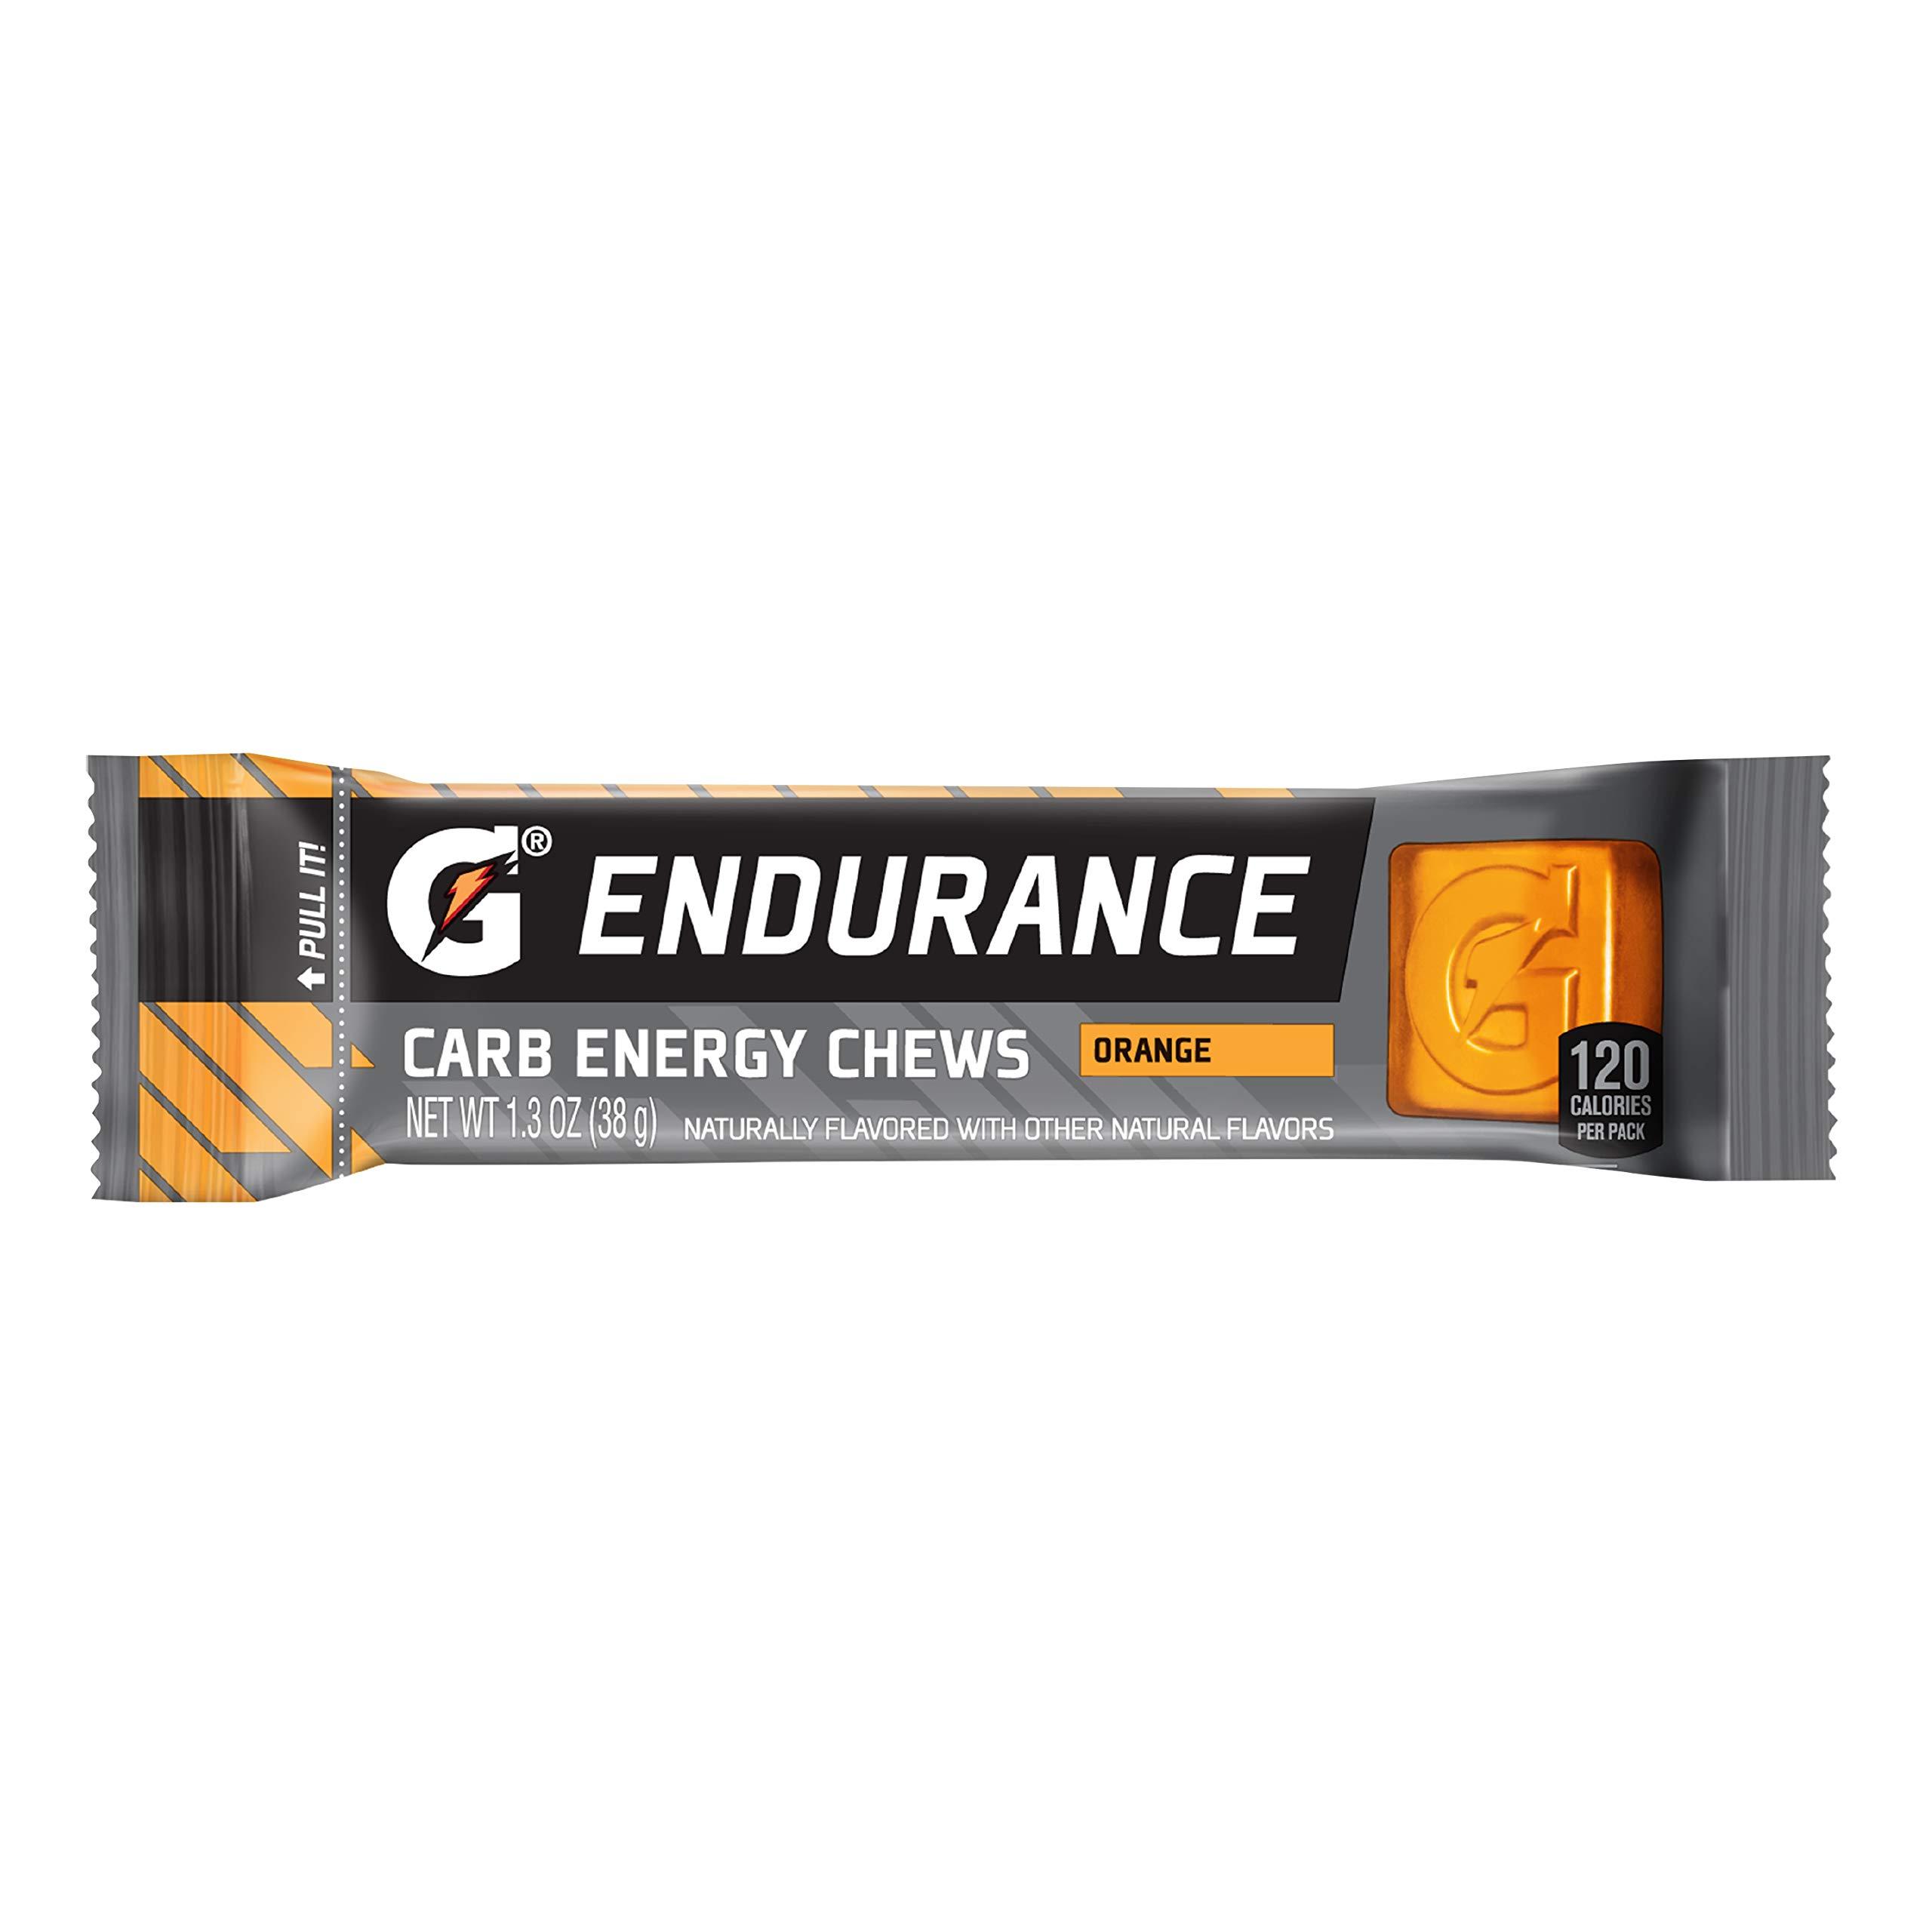 Gatorade Towels Amazon: Amazon.com : Gatorade Endurance Carb Energy Chews, Fruit